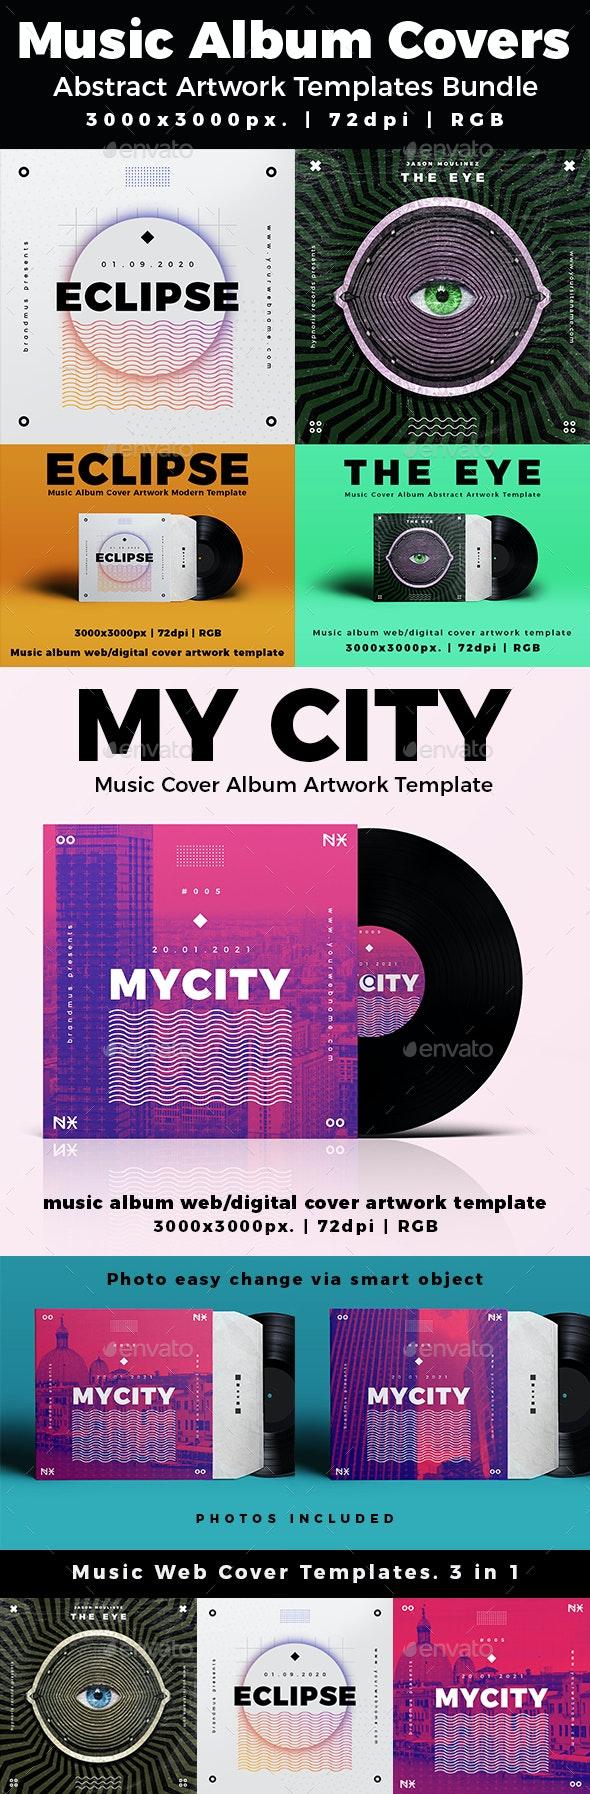 Music Album Cover Abstract Artwork Templates Bundle - Miscellaneous Social Media